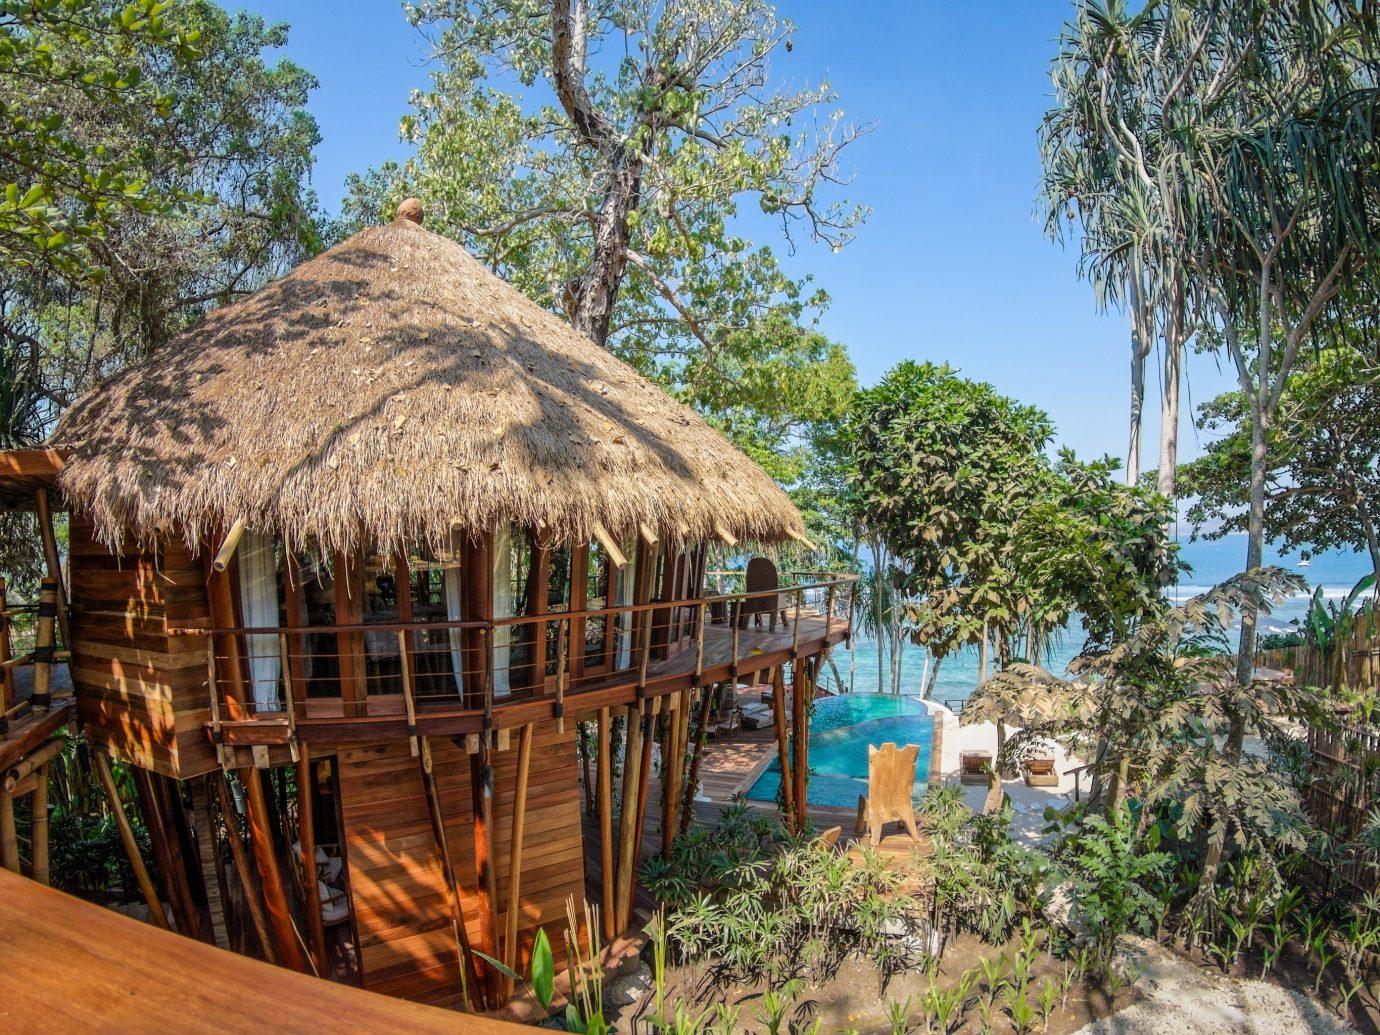 Beach Islands Luxury Travel Trip Ideas tree outdoor umbrella chair Resort hut lawn estate Jungle cottage Village area Garden several surrounded